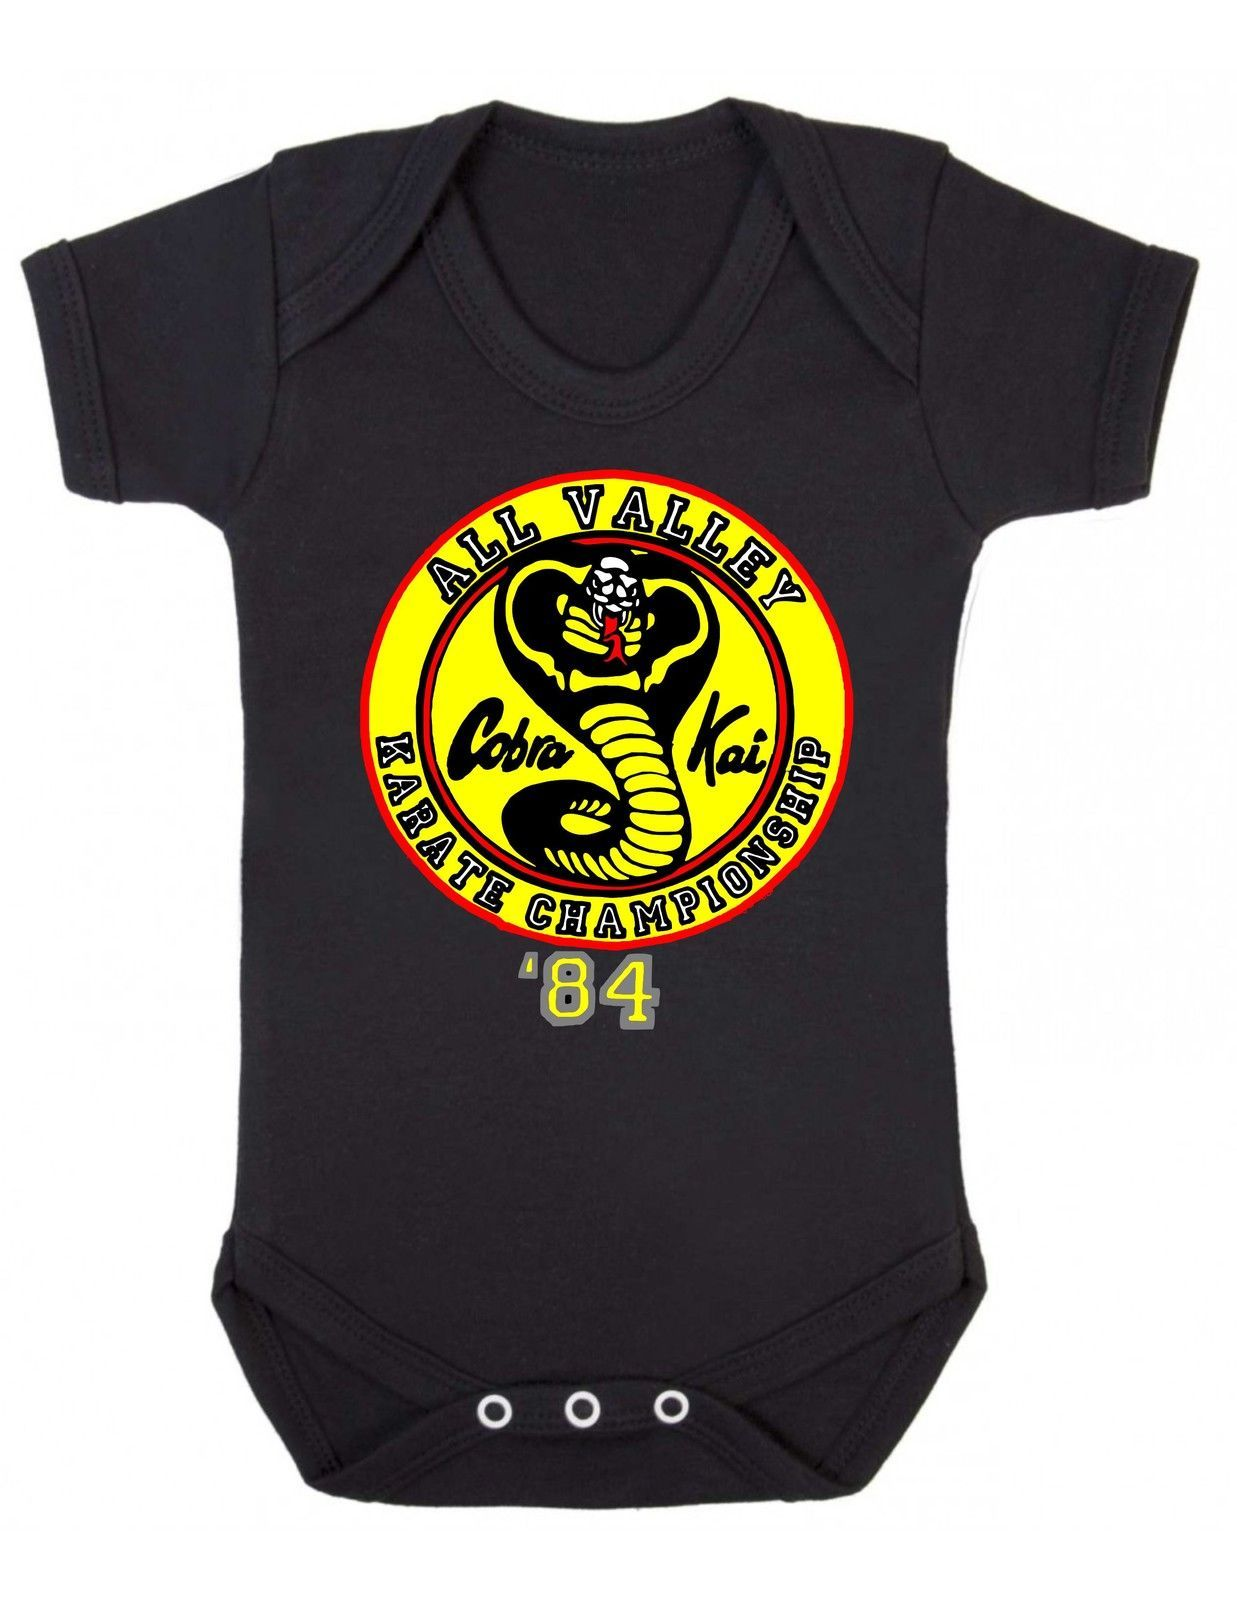 Funny Newborn Gift Baby BodySuit XMAS PRESENT CUTE Karate Cobra Kai BabyGrow